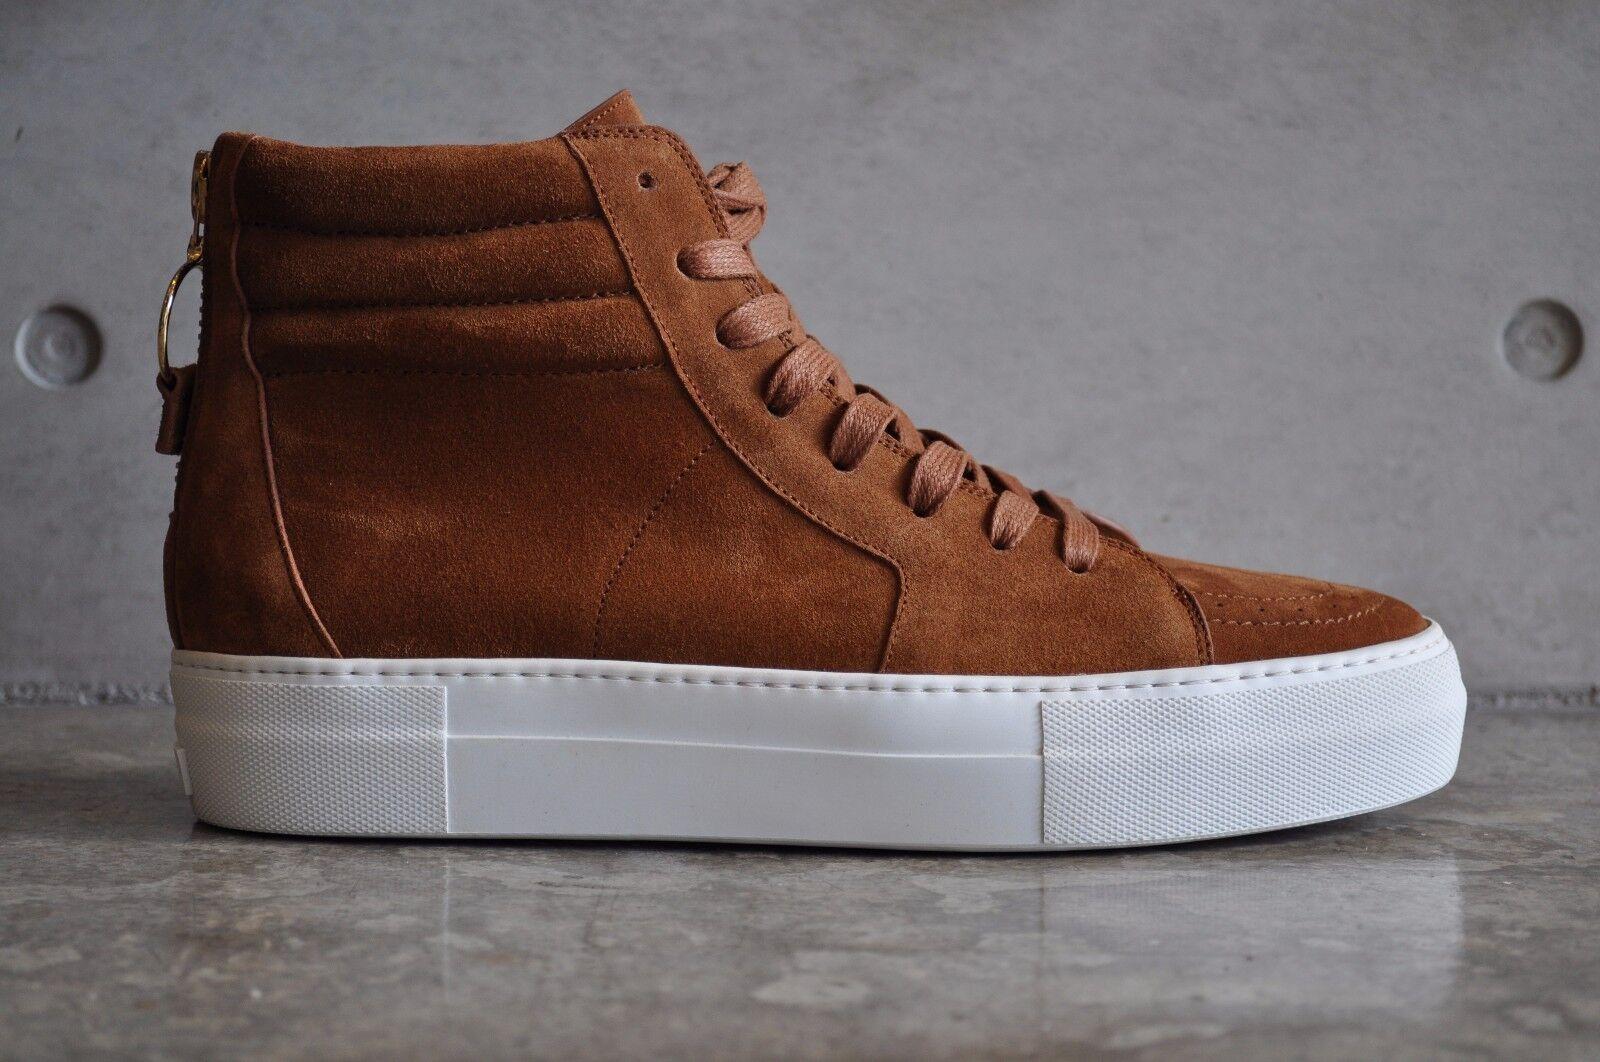 Buscemi 140mm Sk8 Skate High Tan Top Sneaker - Marrón Tan High Calf Suede Leather 25399c